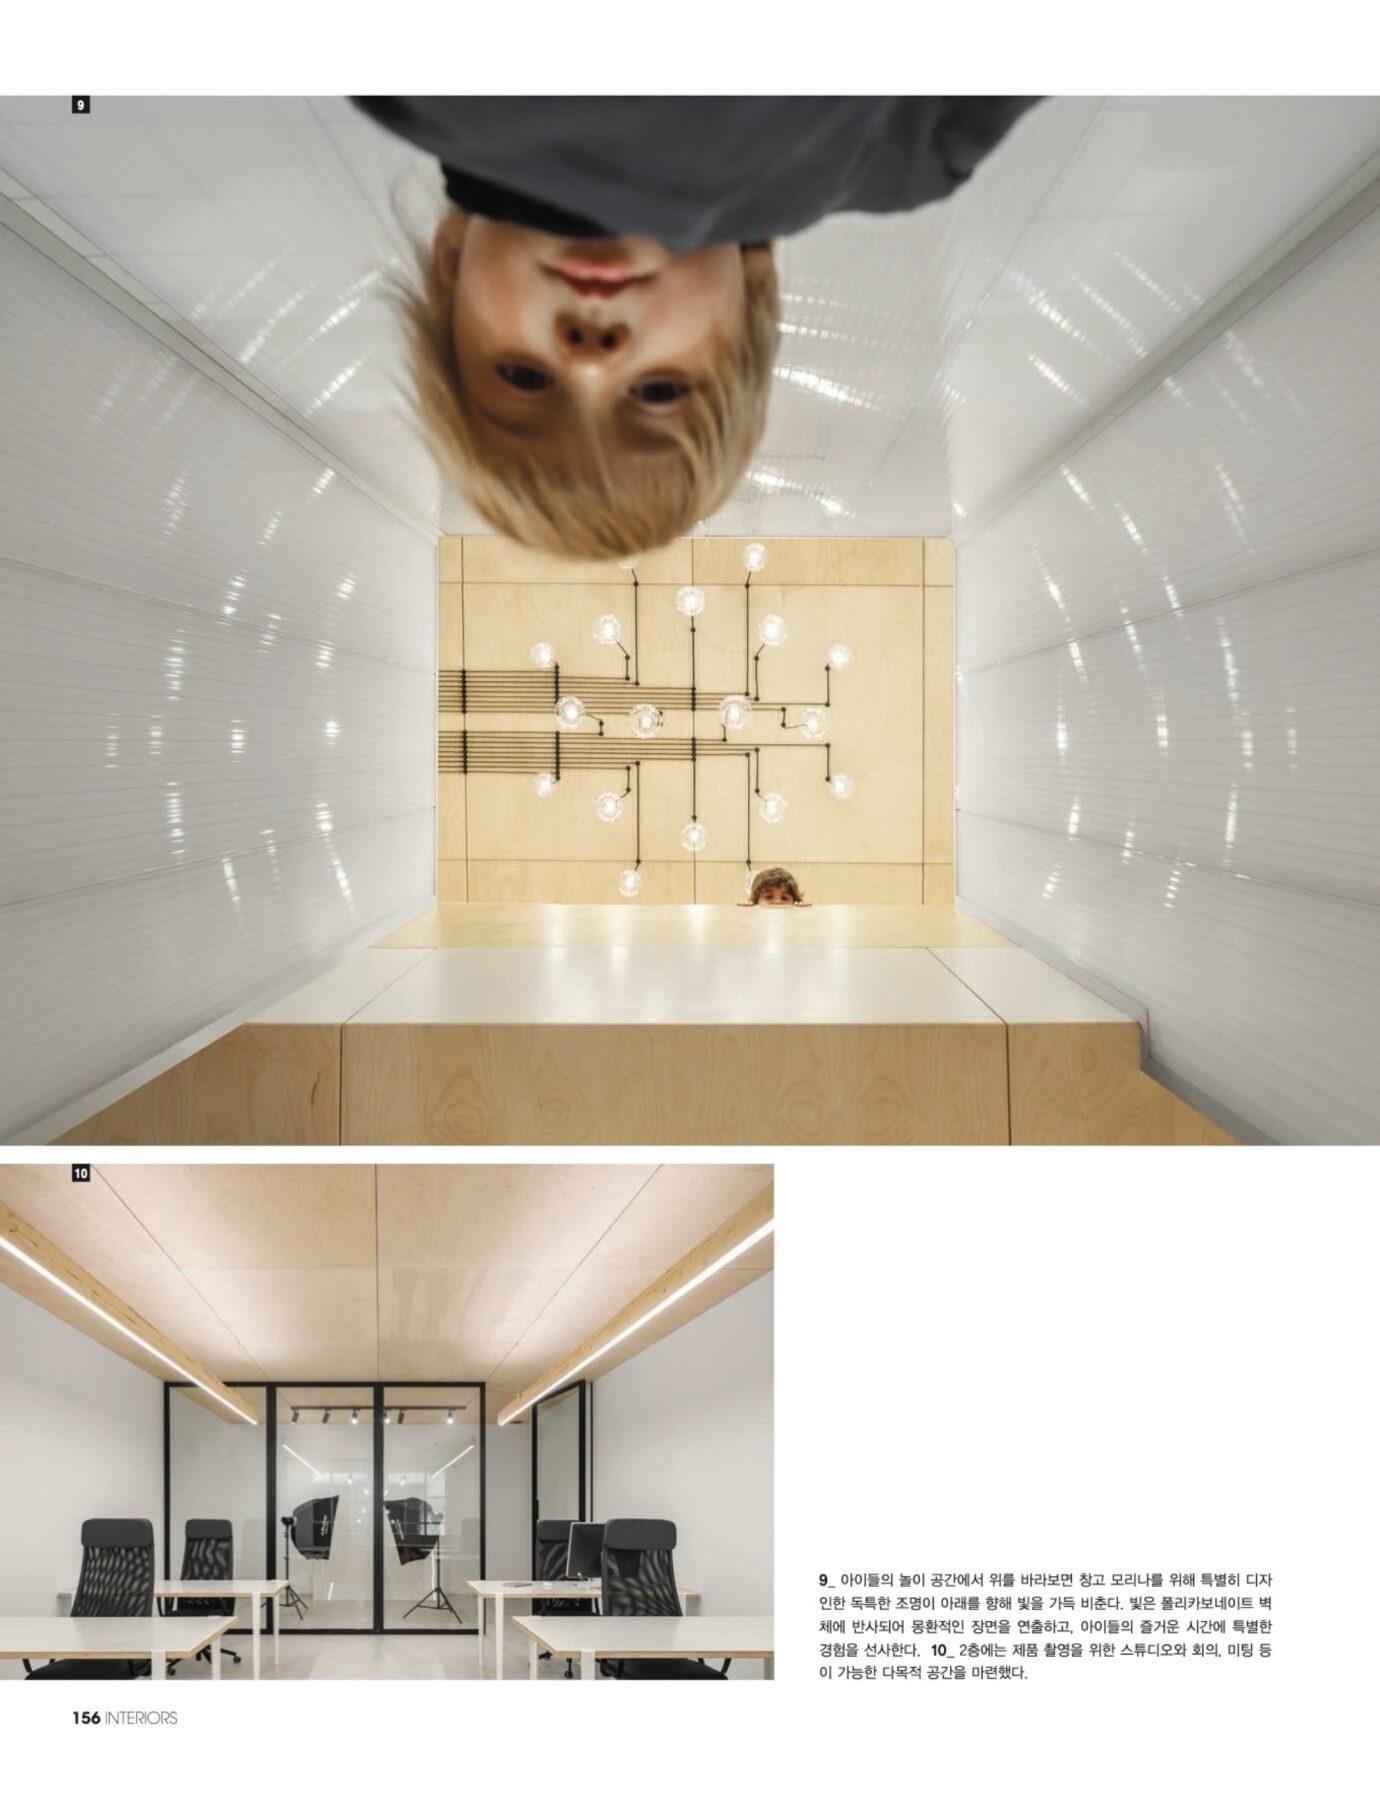 interiors korea studere aramazens morinha 413 13 13